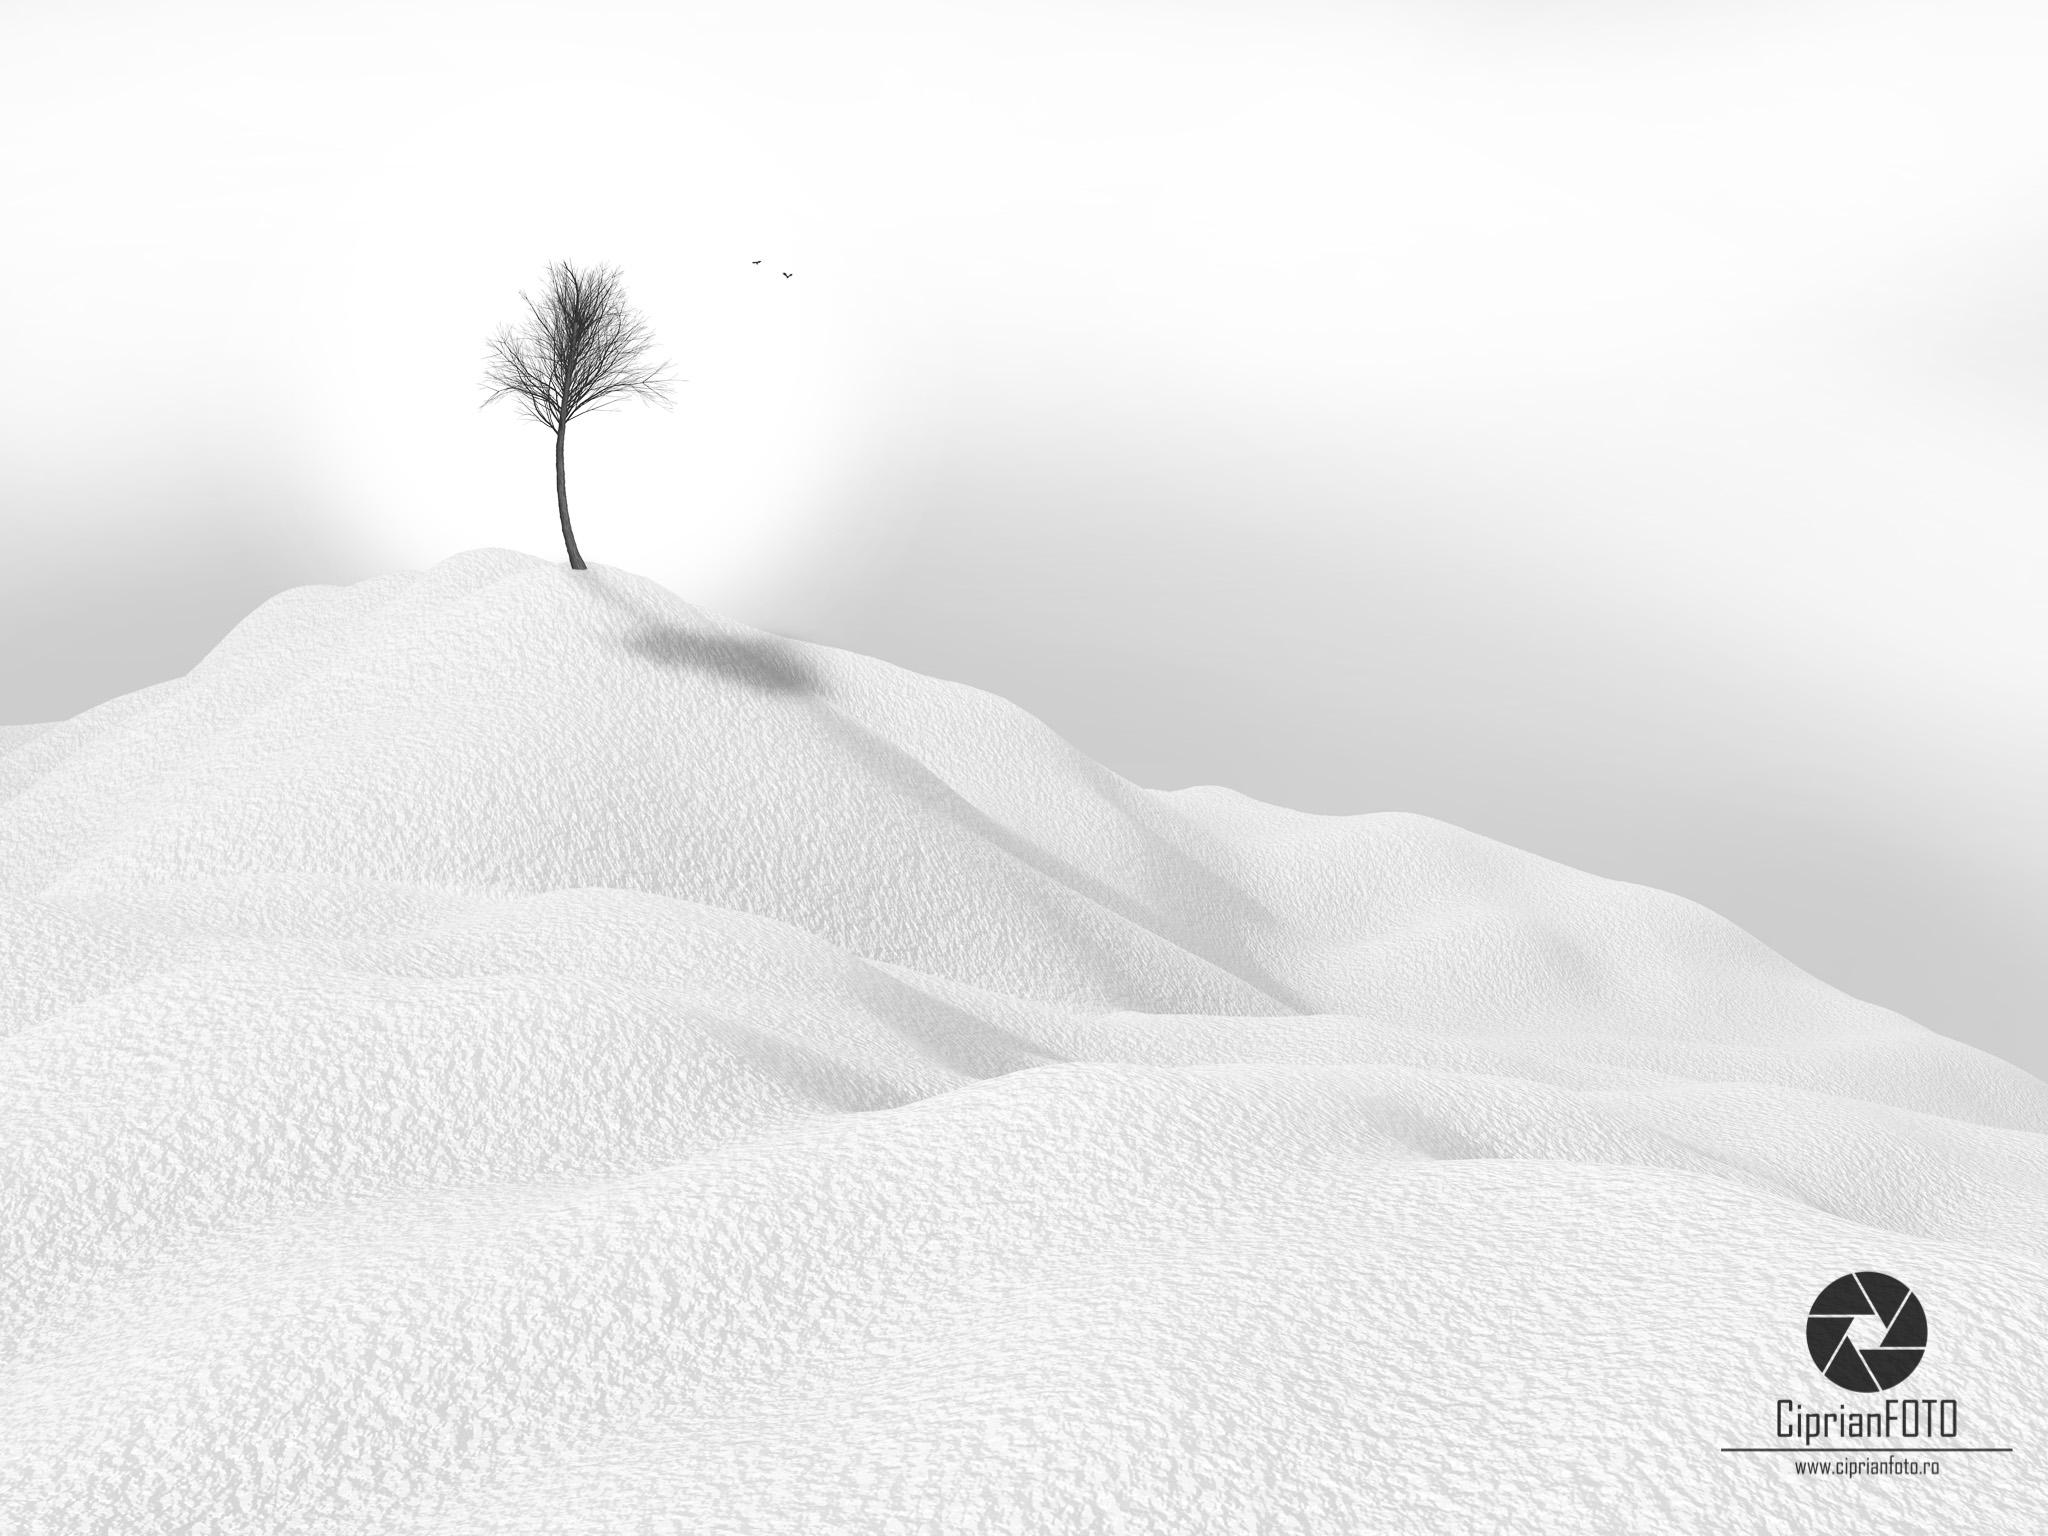 Learn How To Create A Minimalist Winter Landscape In Photoshop CC 2021, Photoshop Manipulation Tutorial, CiprianFOTO, Photoshop Tutorial